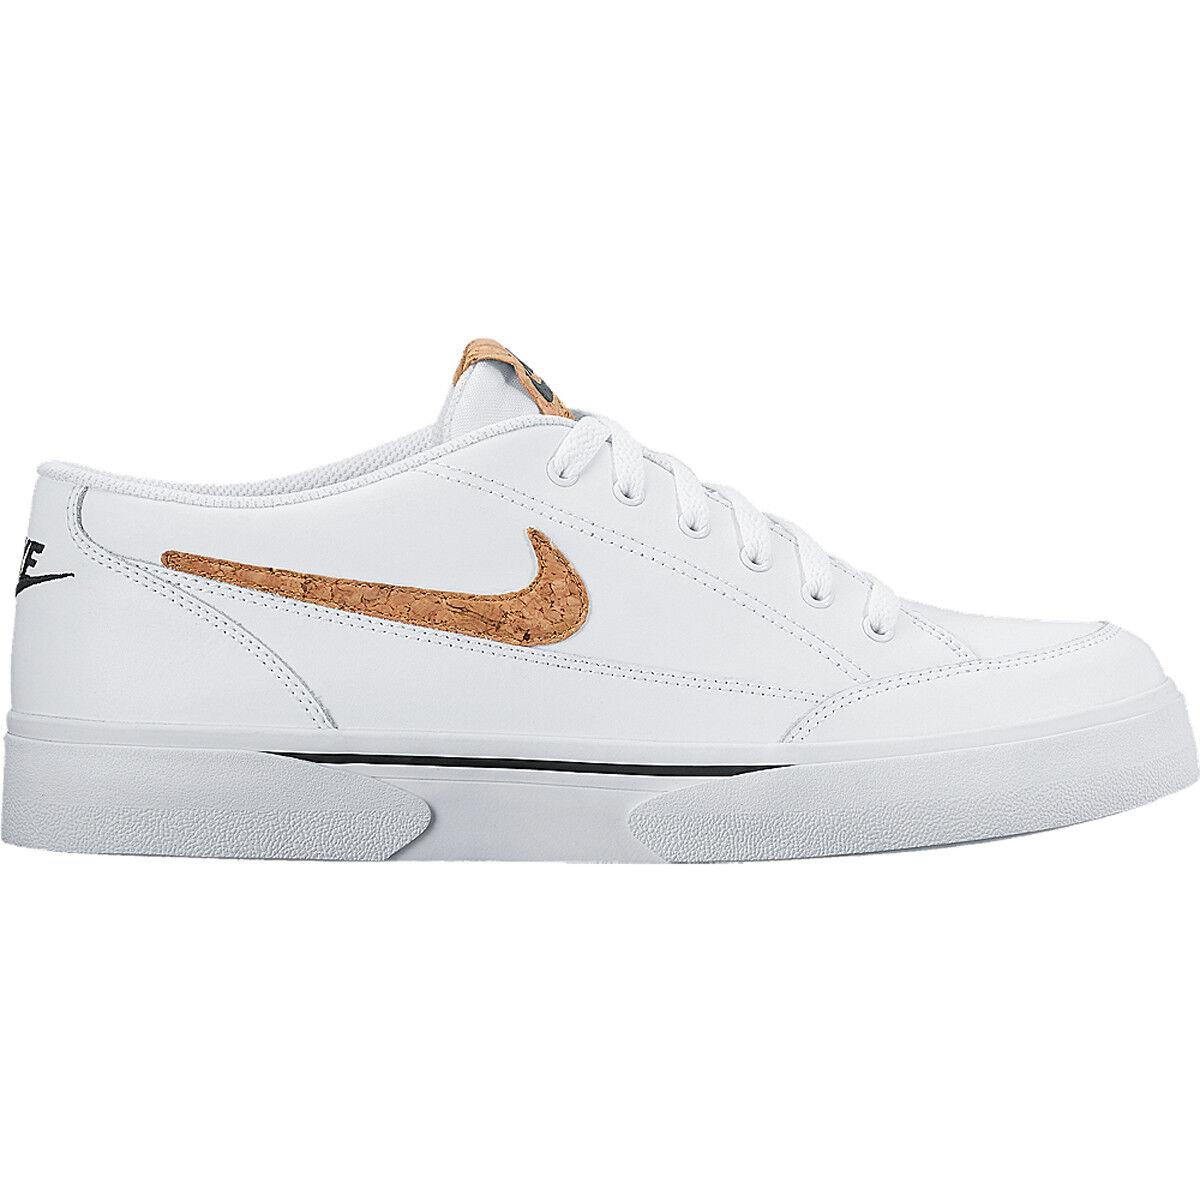 Nike - turnschuhe 16 mens gts fashion - 16 turnschuhe f406f9